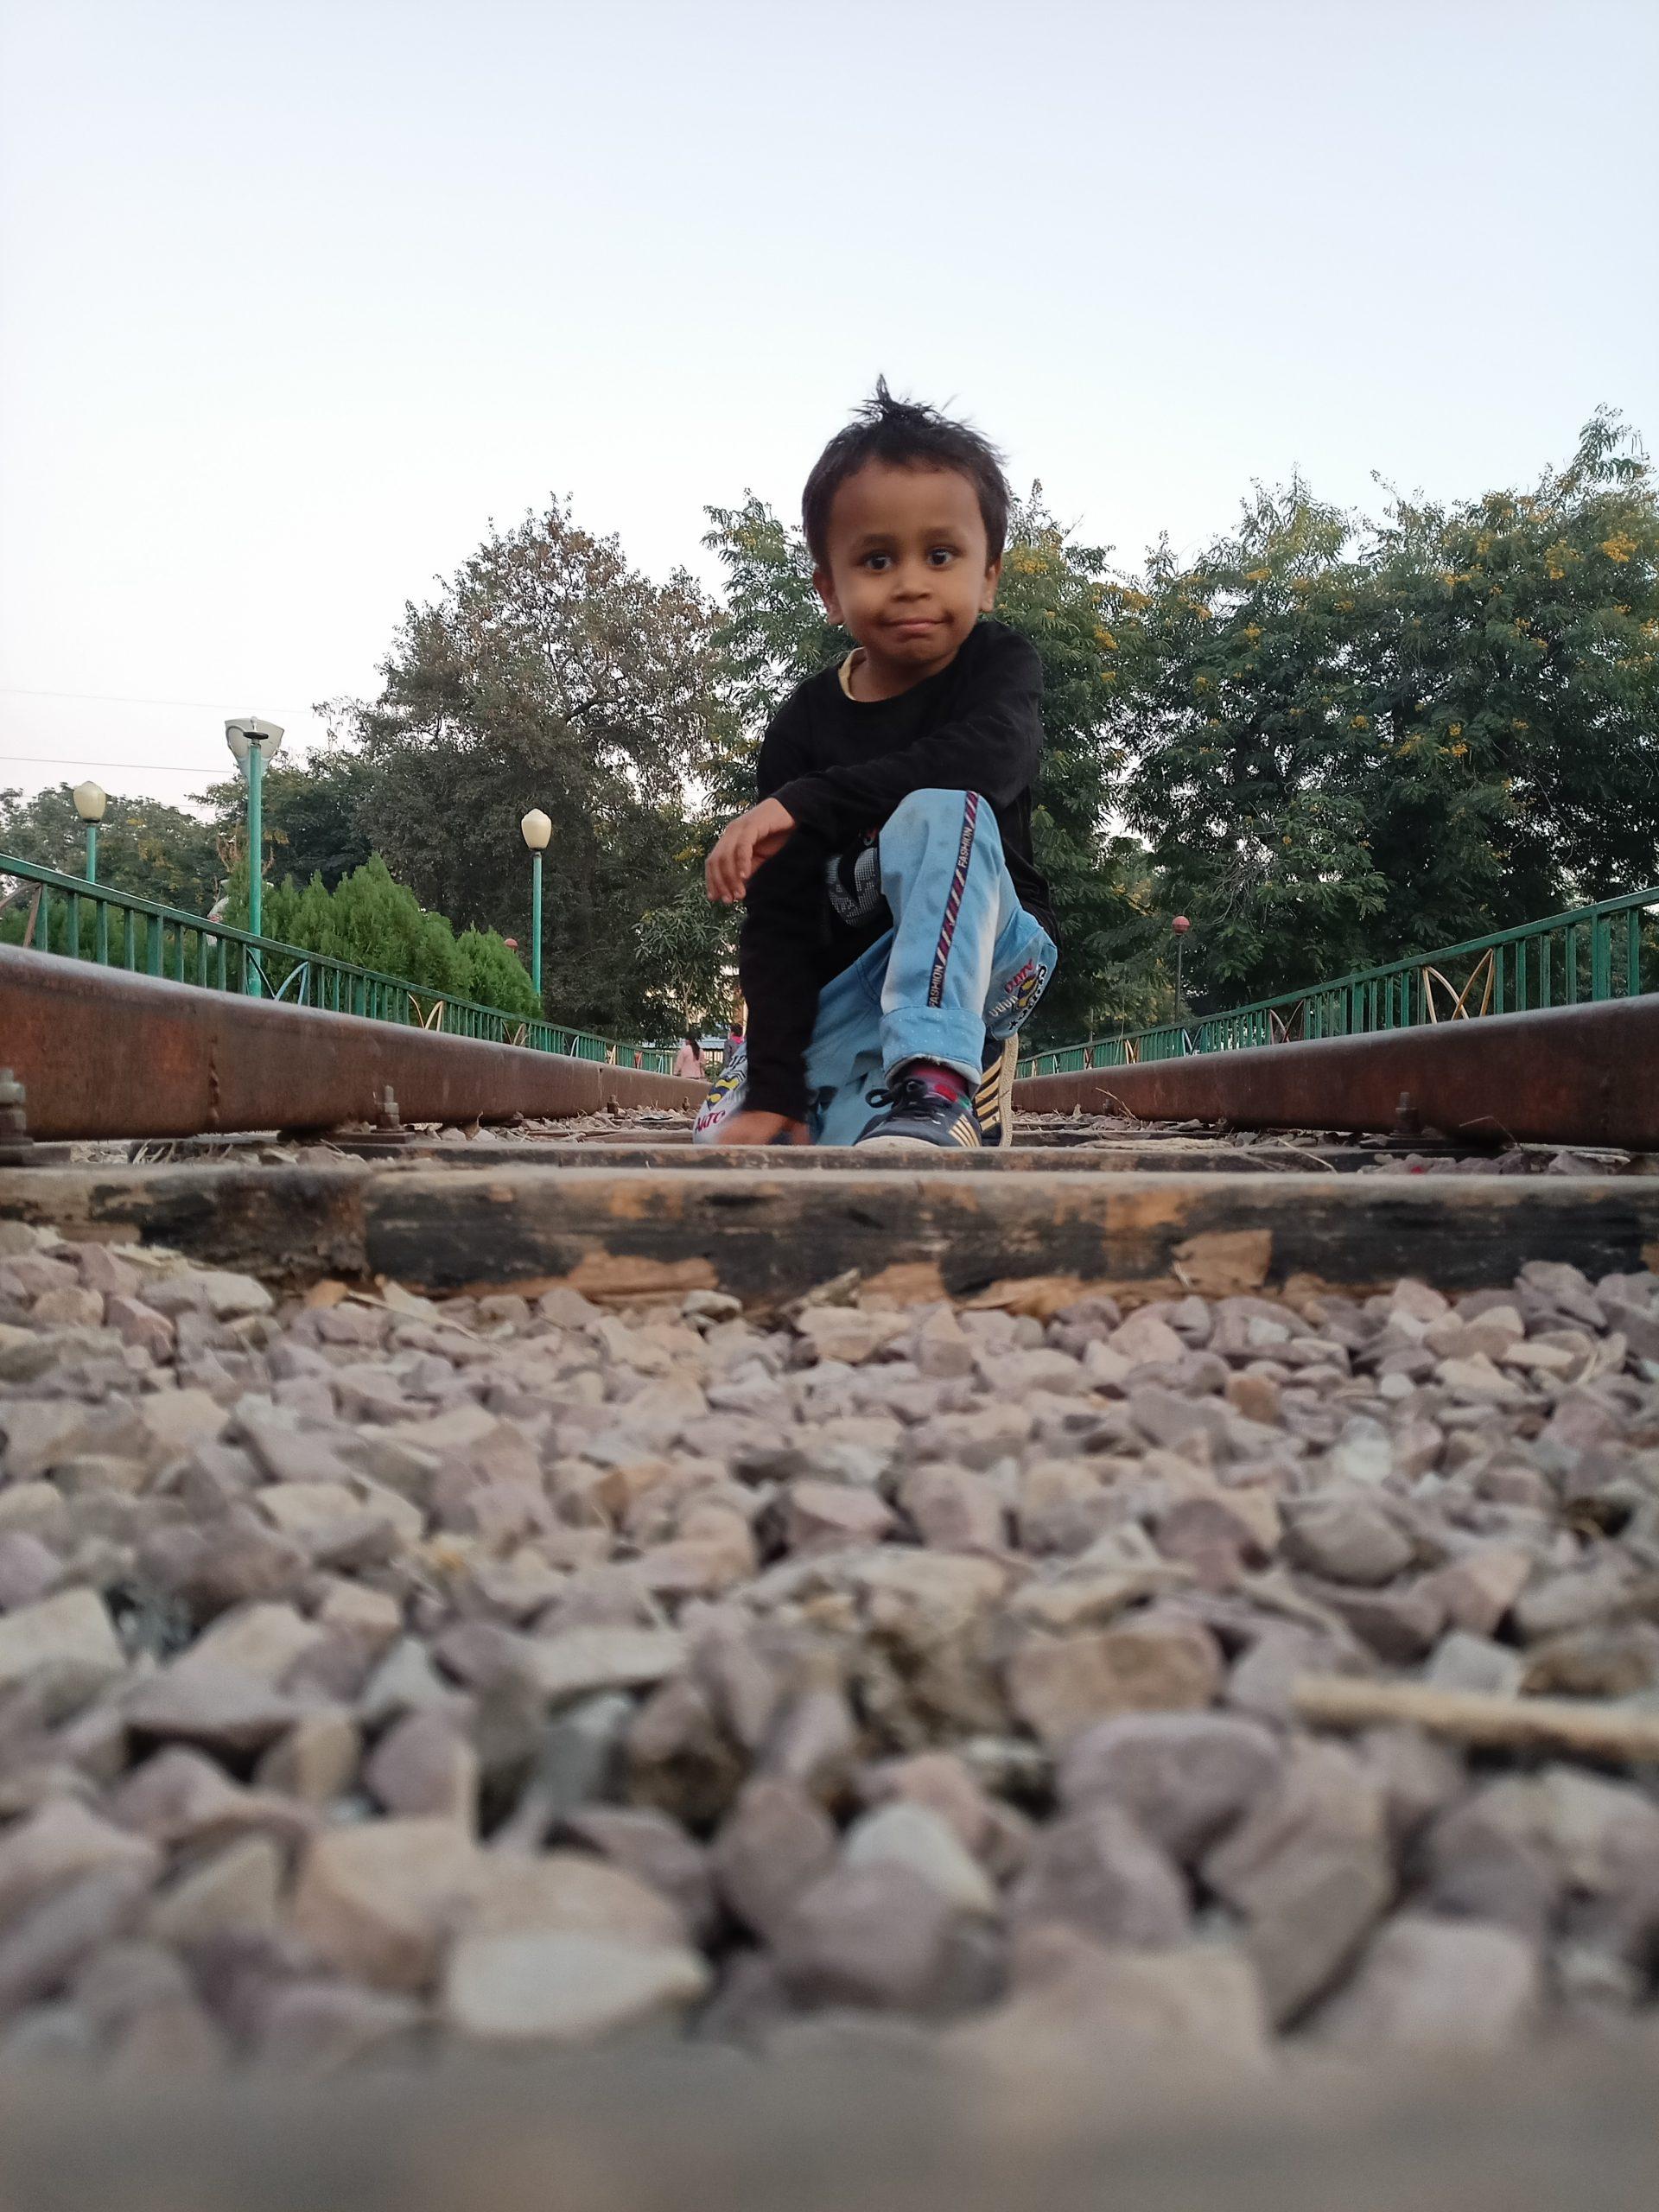 A kid posing on a railway track